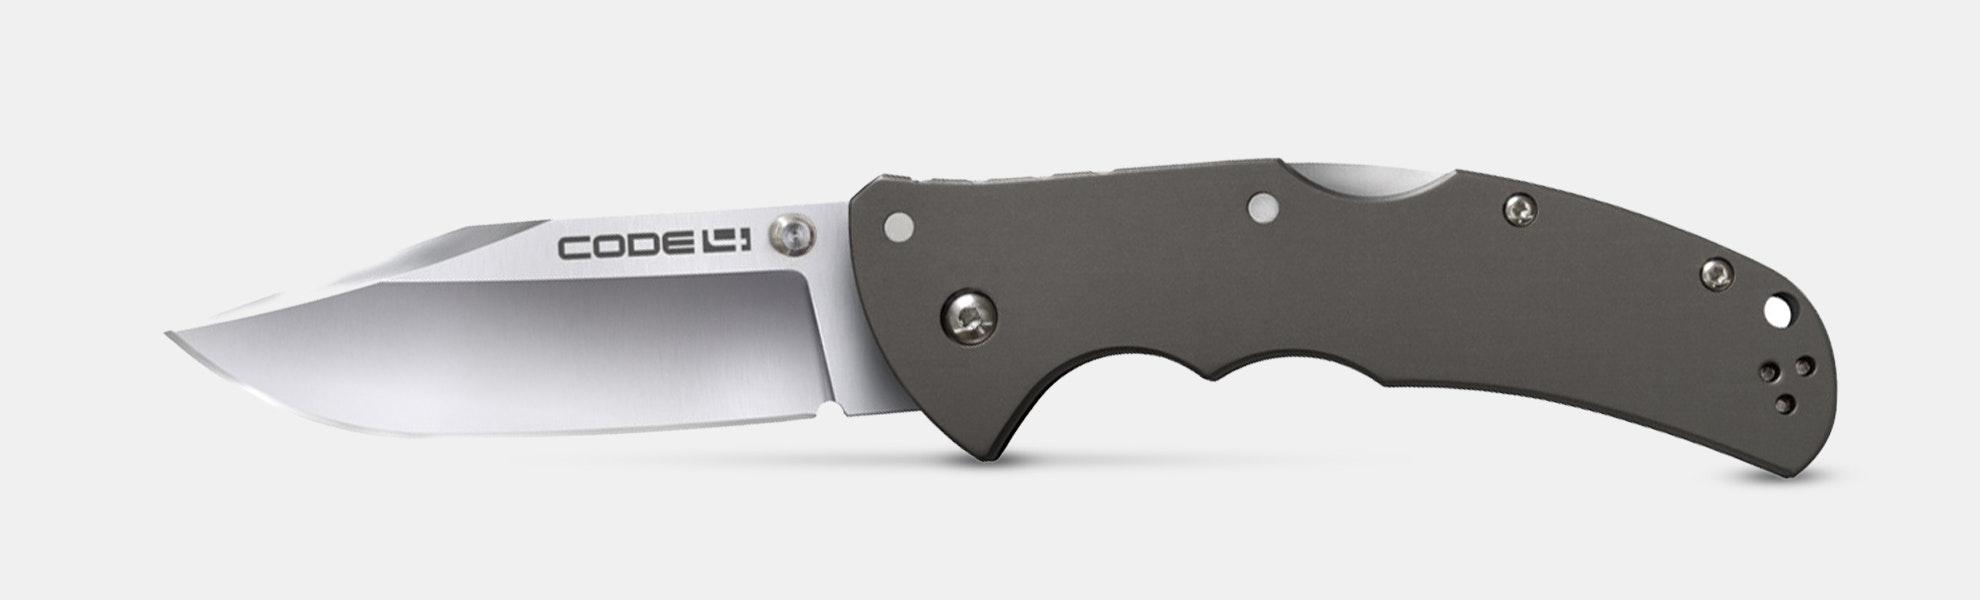 Cold Steel Code 4 Knife